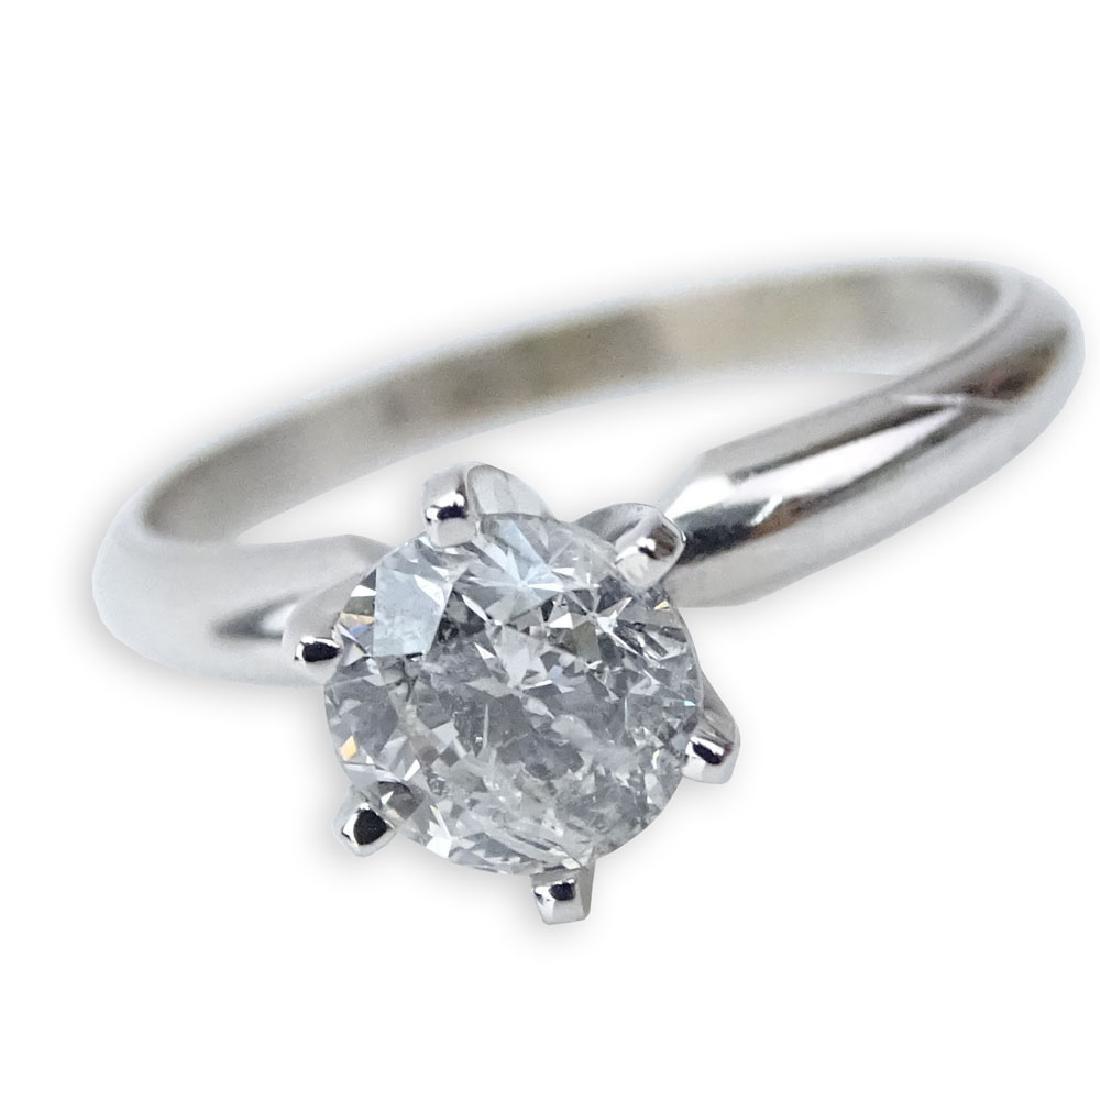 AIG Certified 1.00 Carat Round Brilliant Cut Diamond